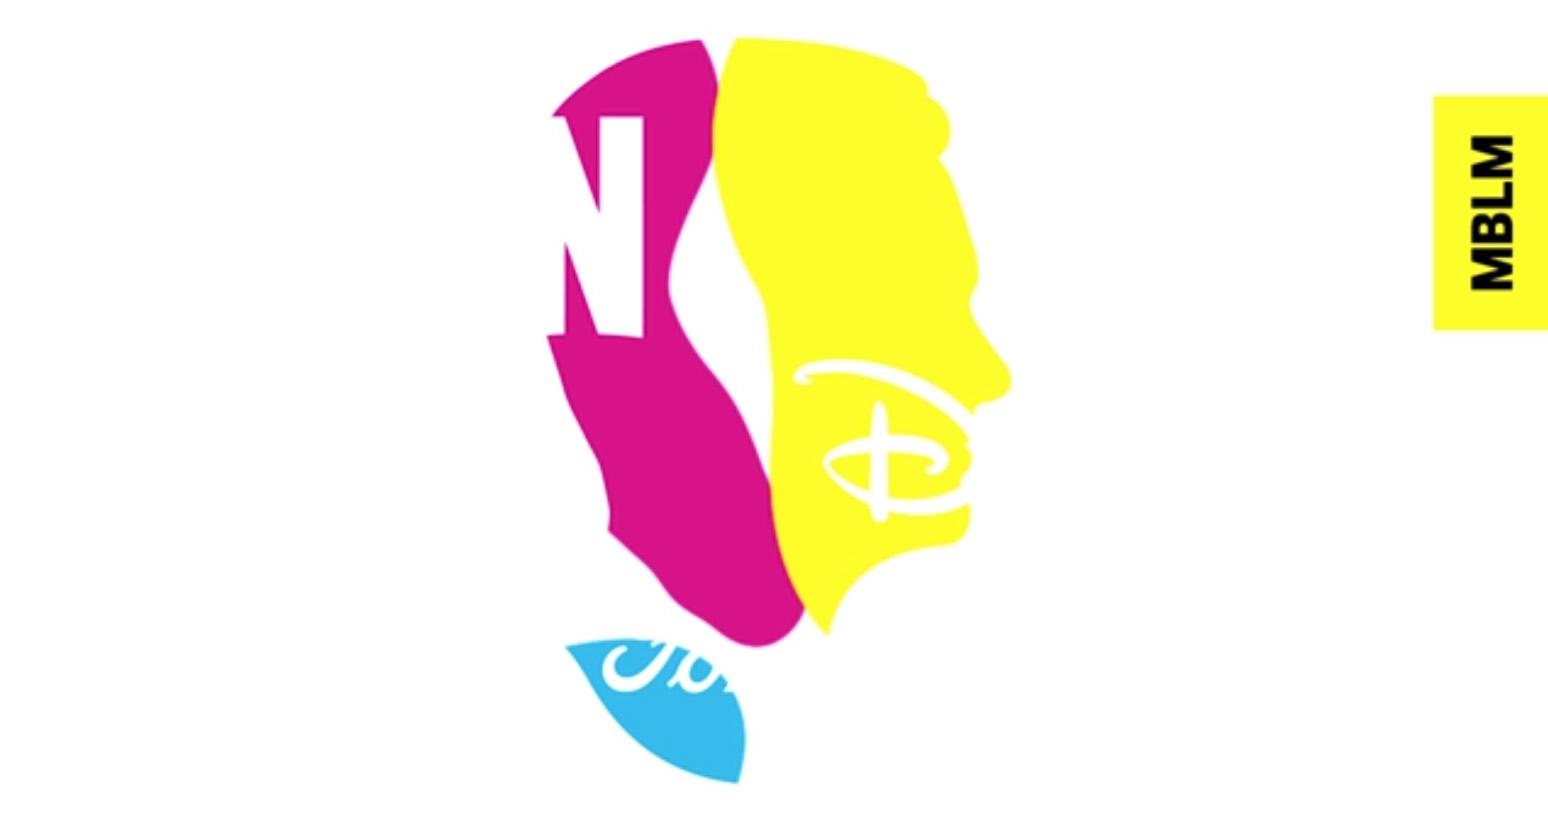 Brand Intimacy 2019 Study Logos